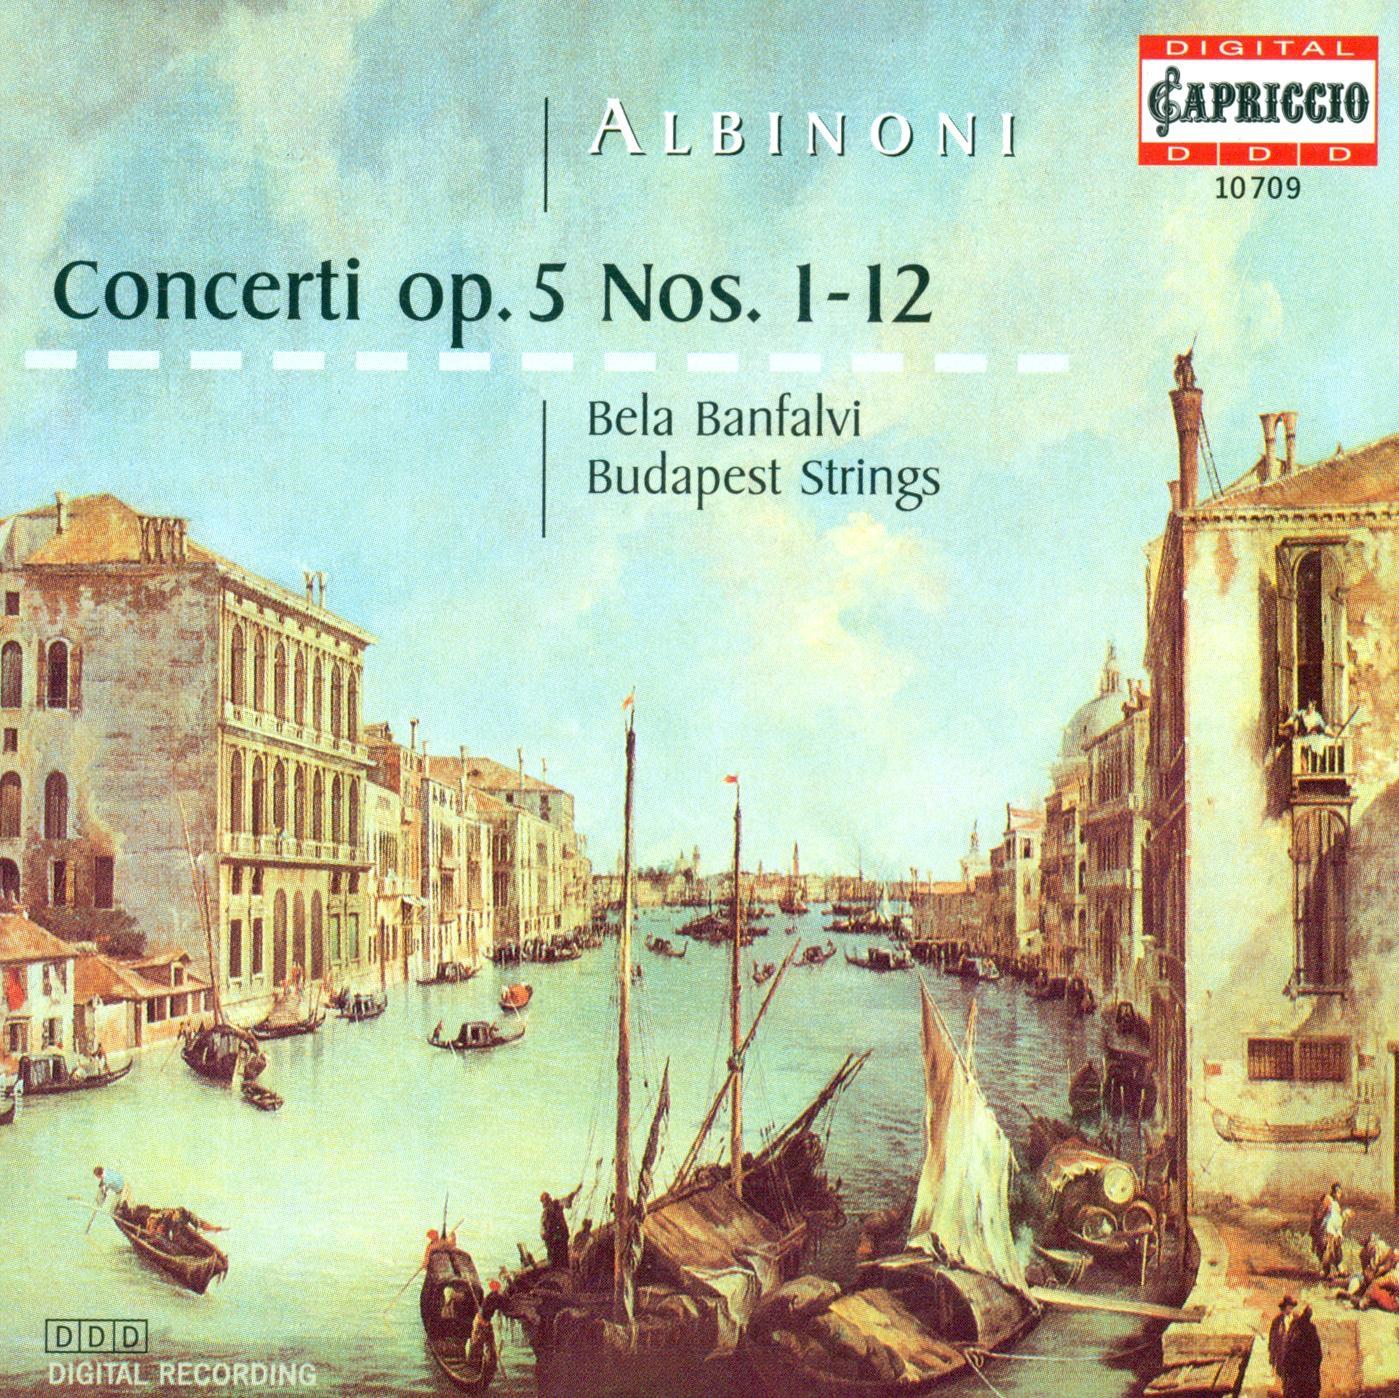 Albinoni: Concerti a 5, Opp. 5, Nos. 1-12